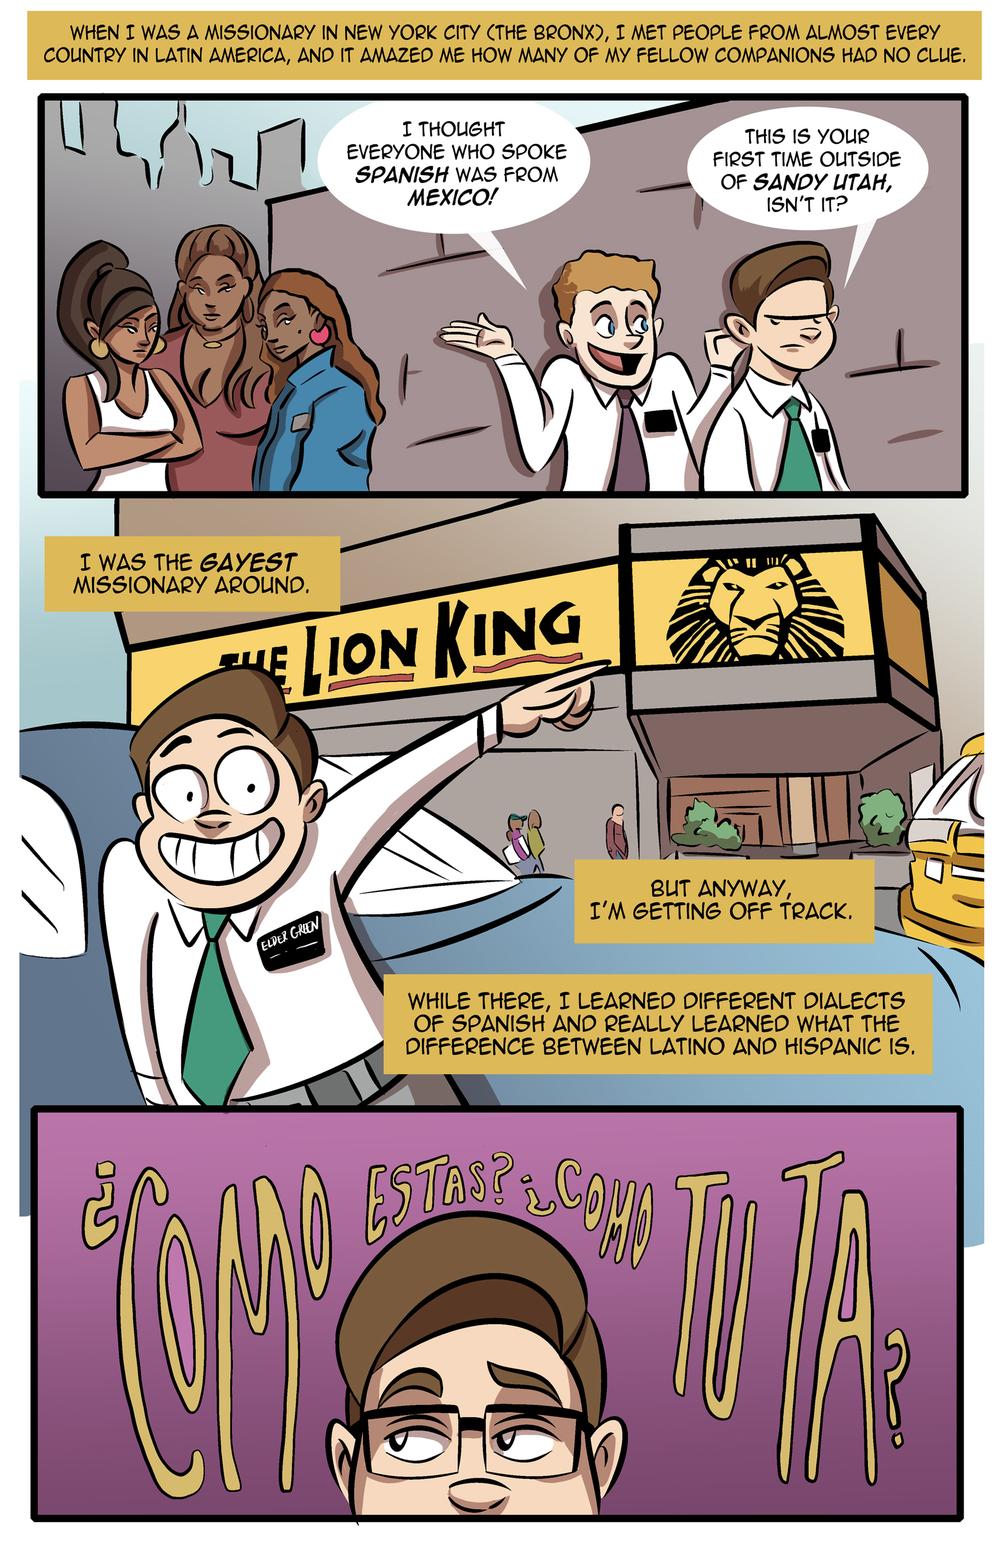 Latin comic Page 04.jpg